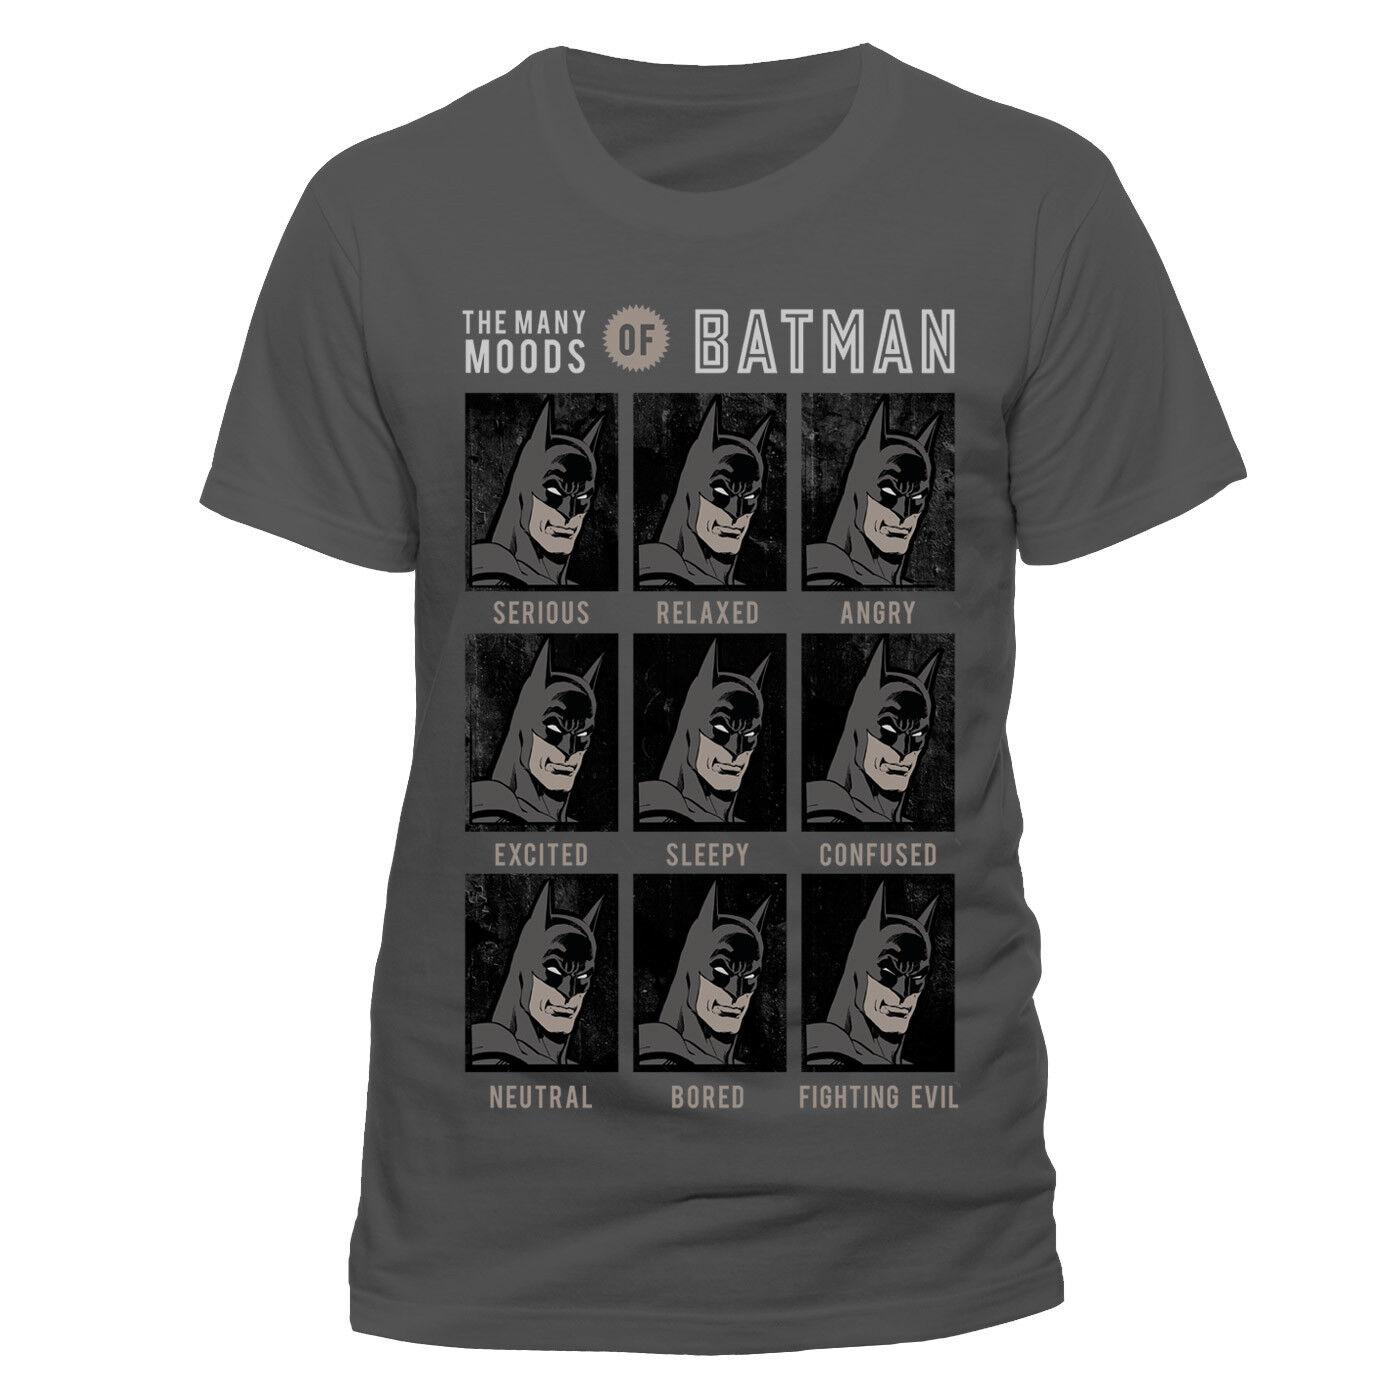 Officiel Batman moods of Batman T Shirt Gris Nouveau DC XL Originals S M L XL DC XXL 6679fd